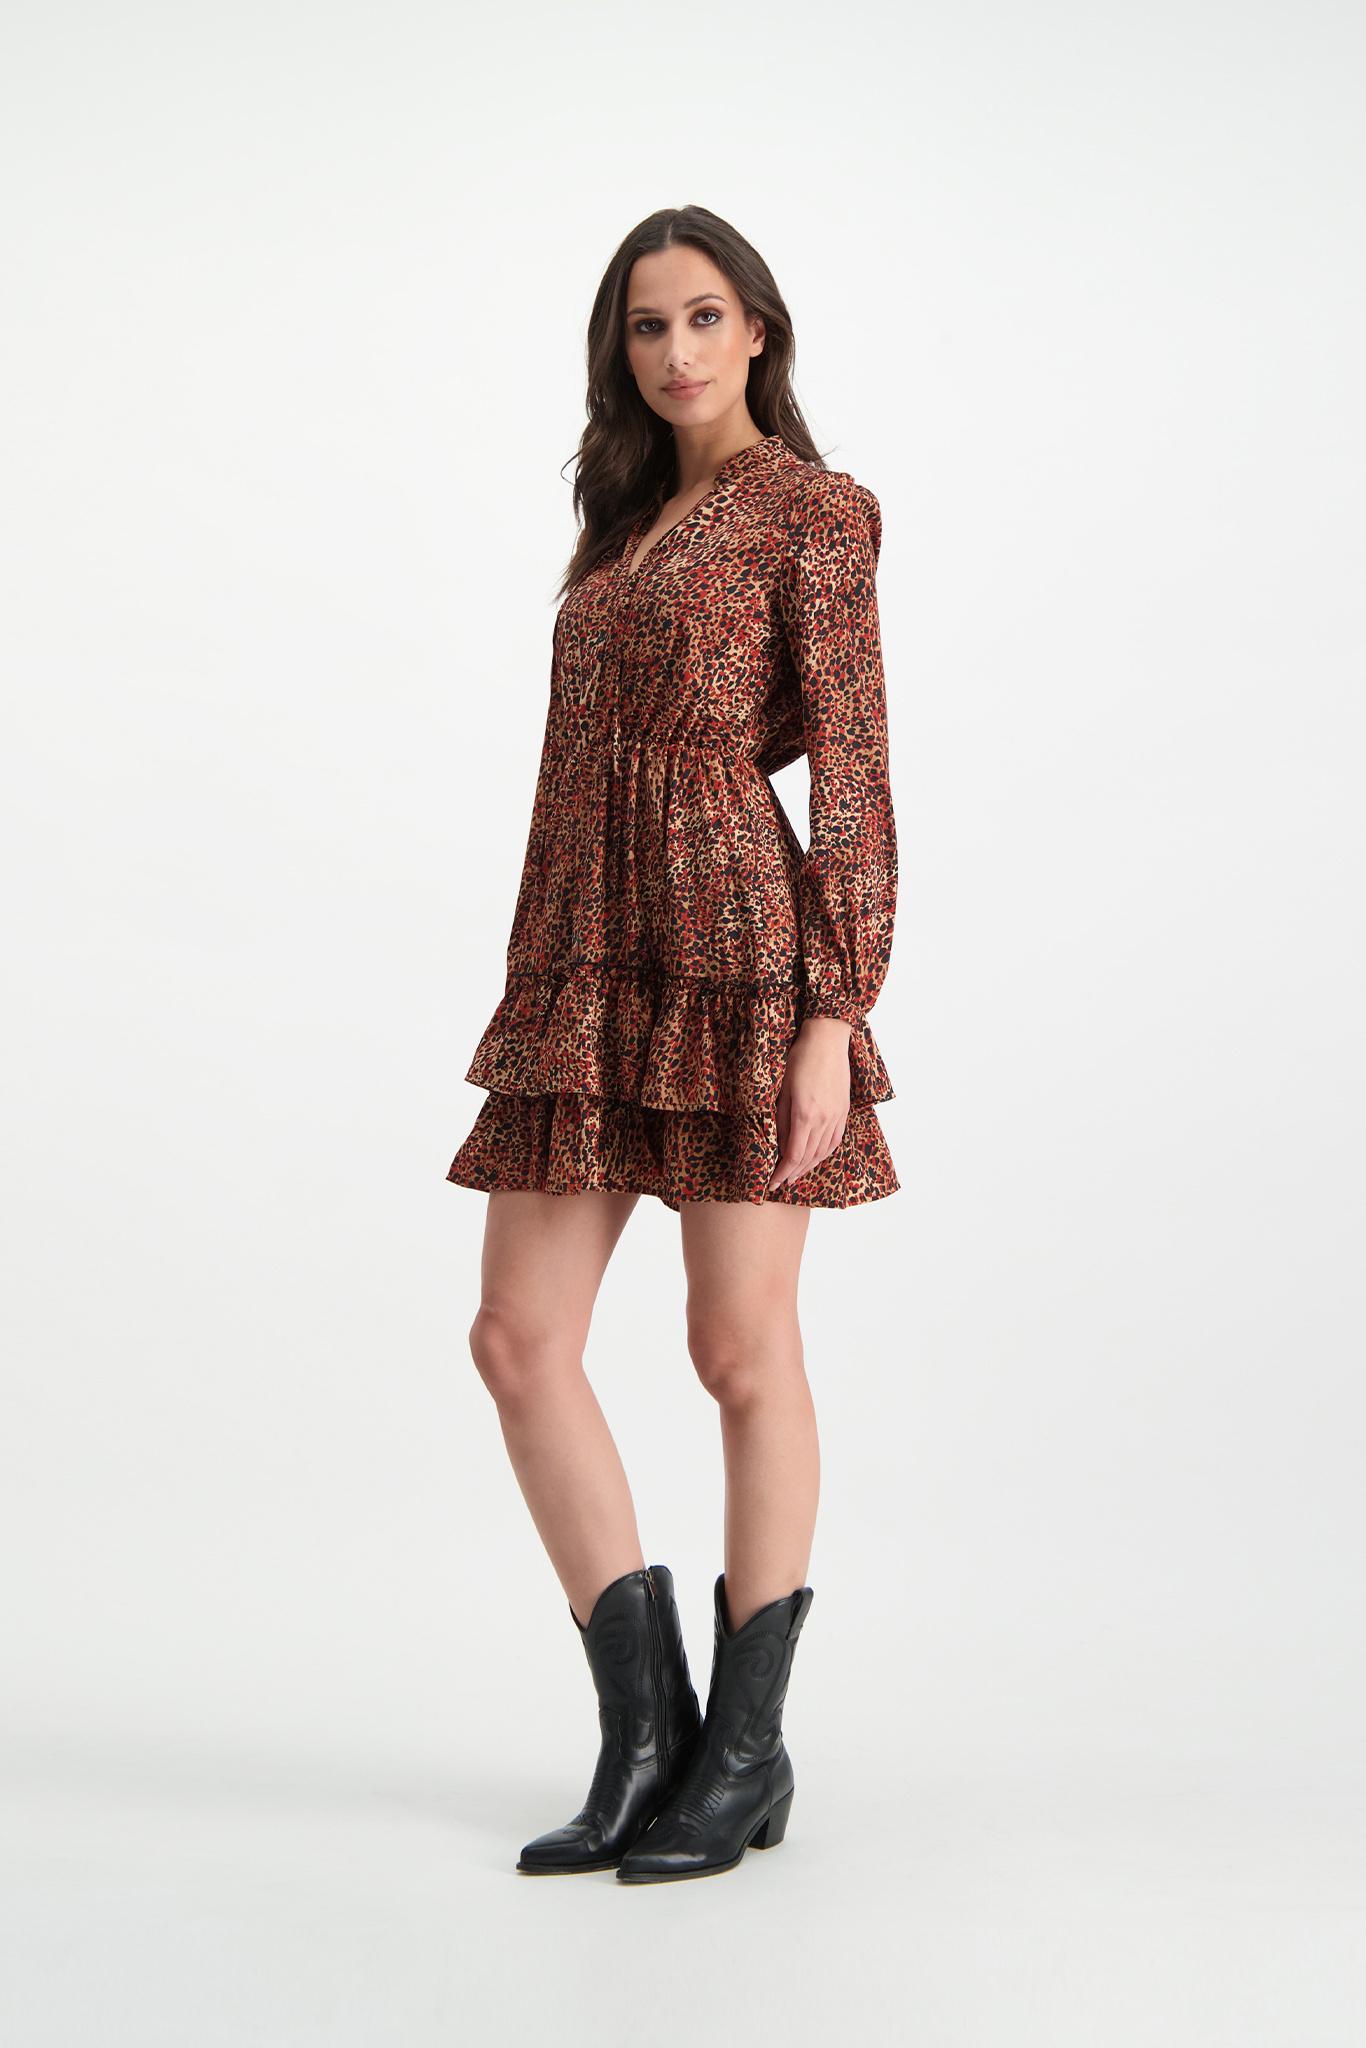 Lofty Manner Red Panther Print Dress Fayah